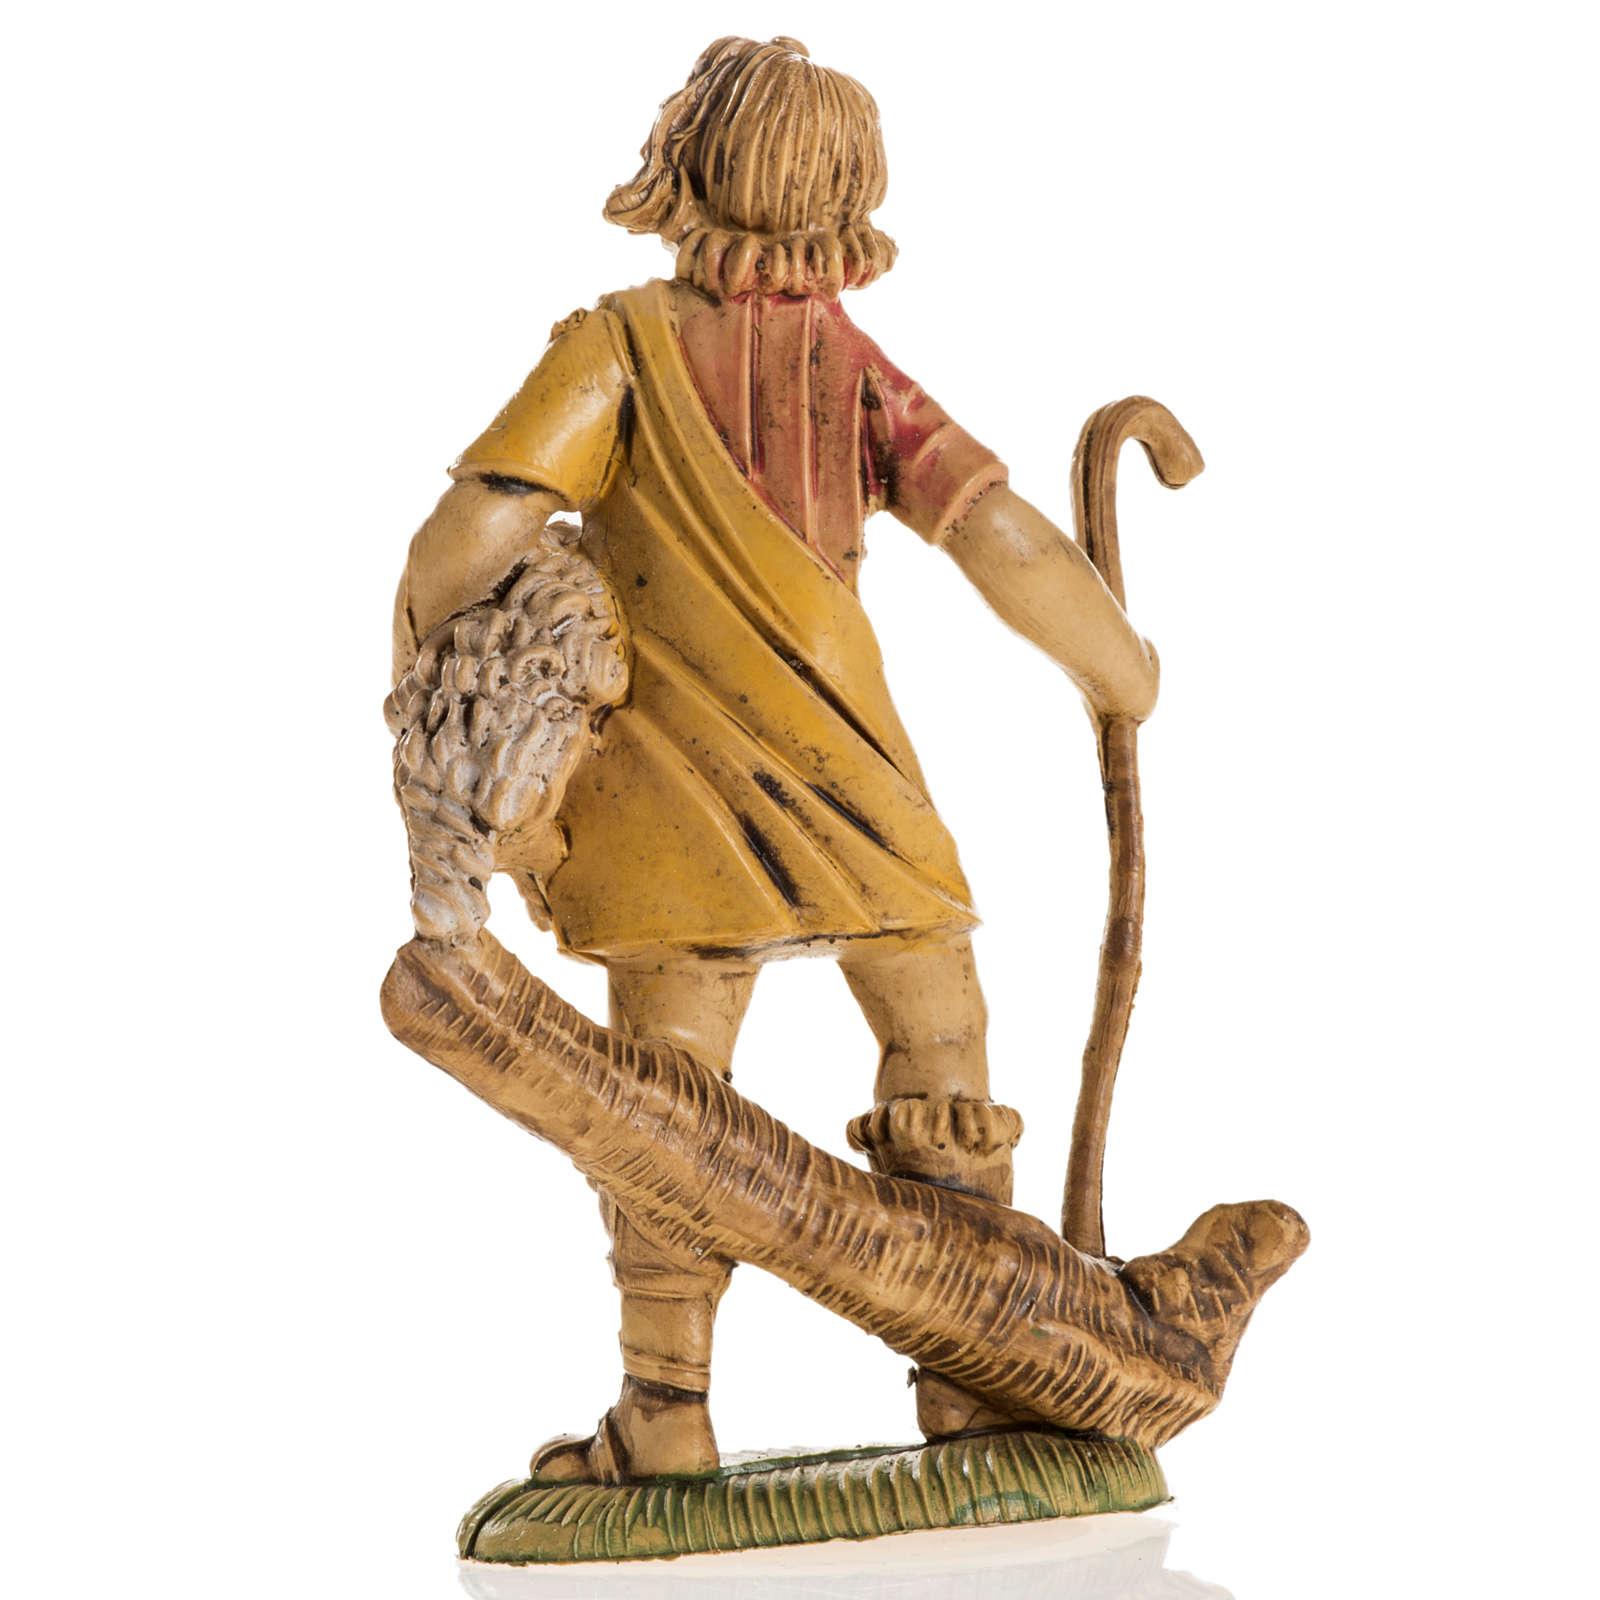 Nativity scene figurine, shepherd with lamb 8cm 3